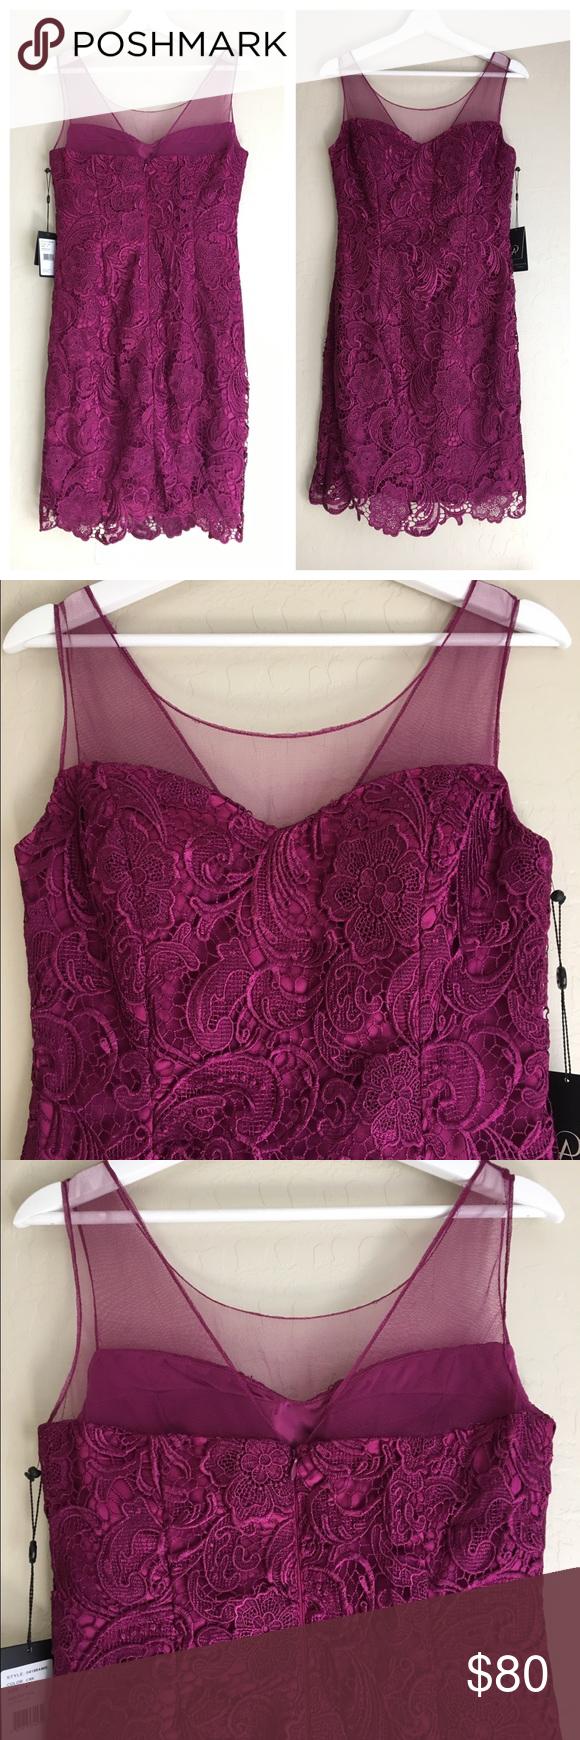 Adrianna Papell Magenta Illusion Lace Dress NWT Gorgeous magenta ...